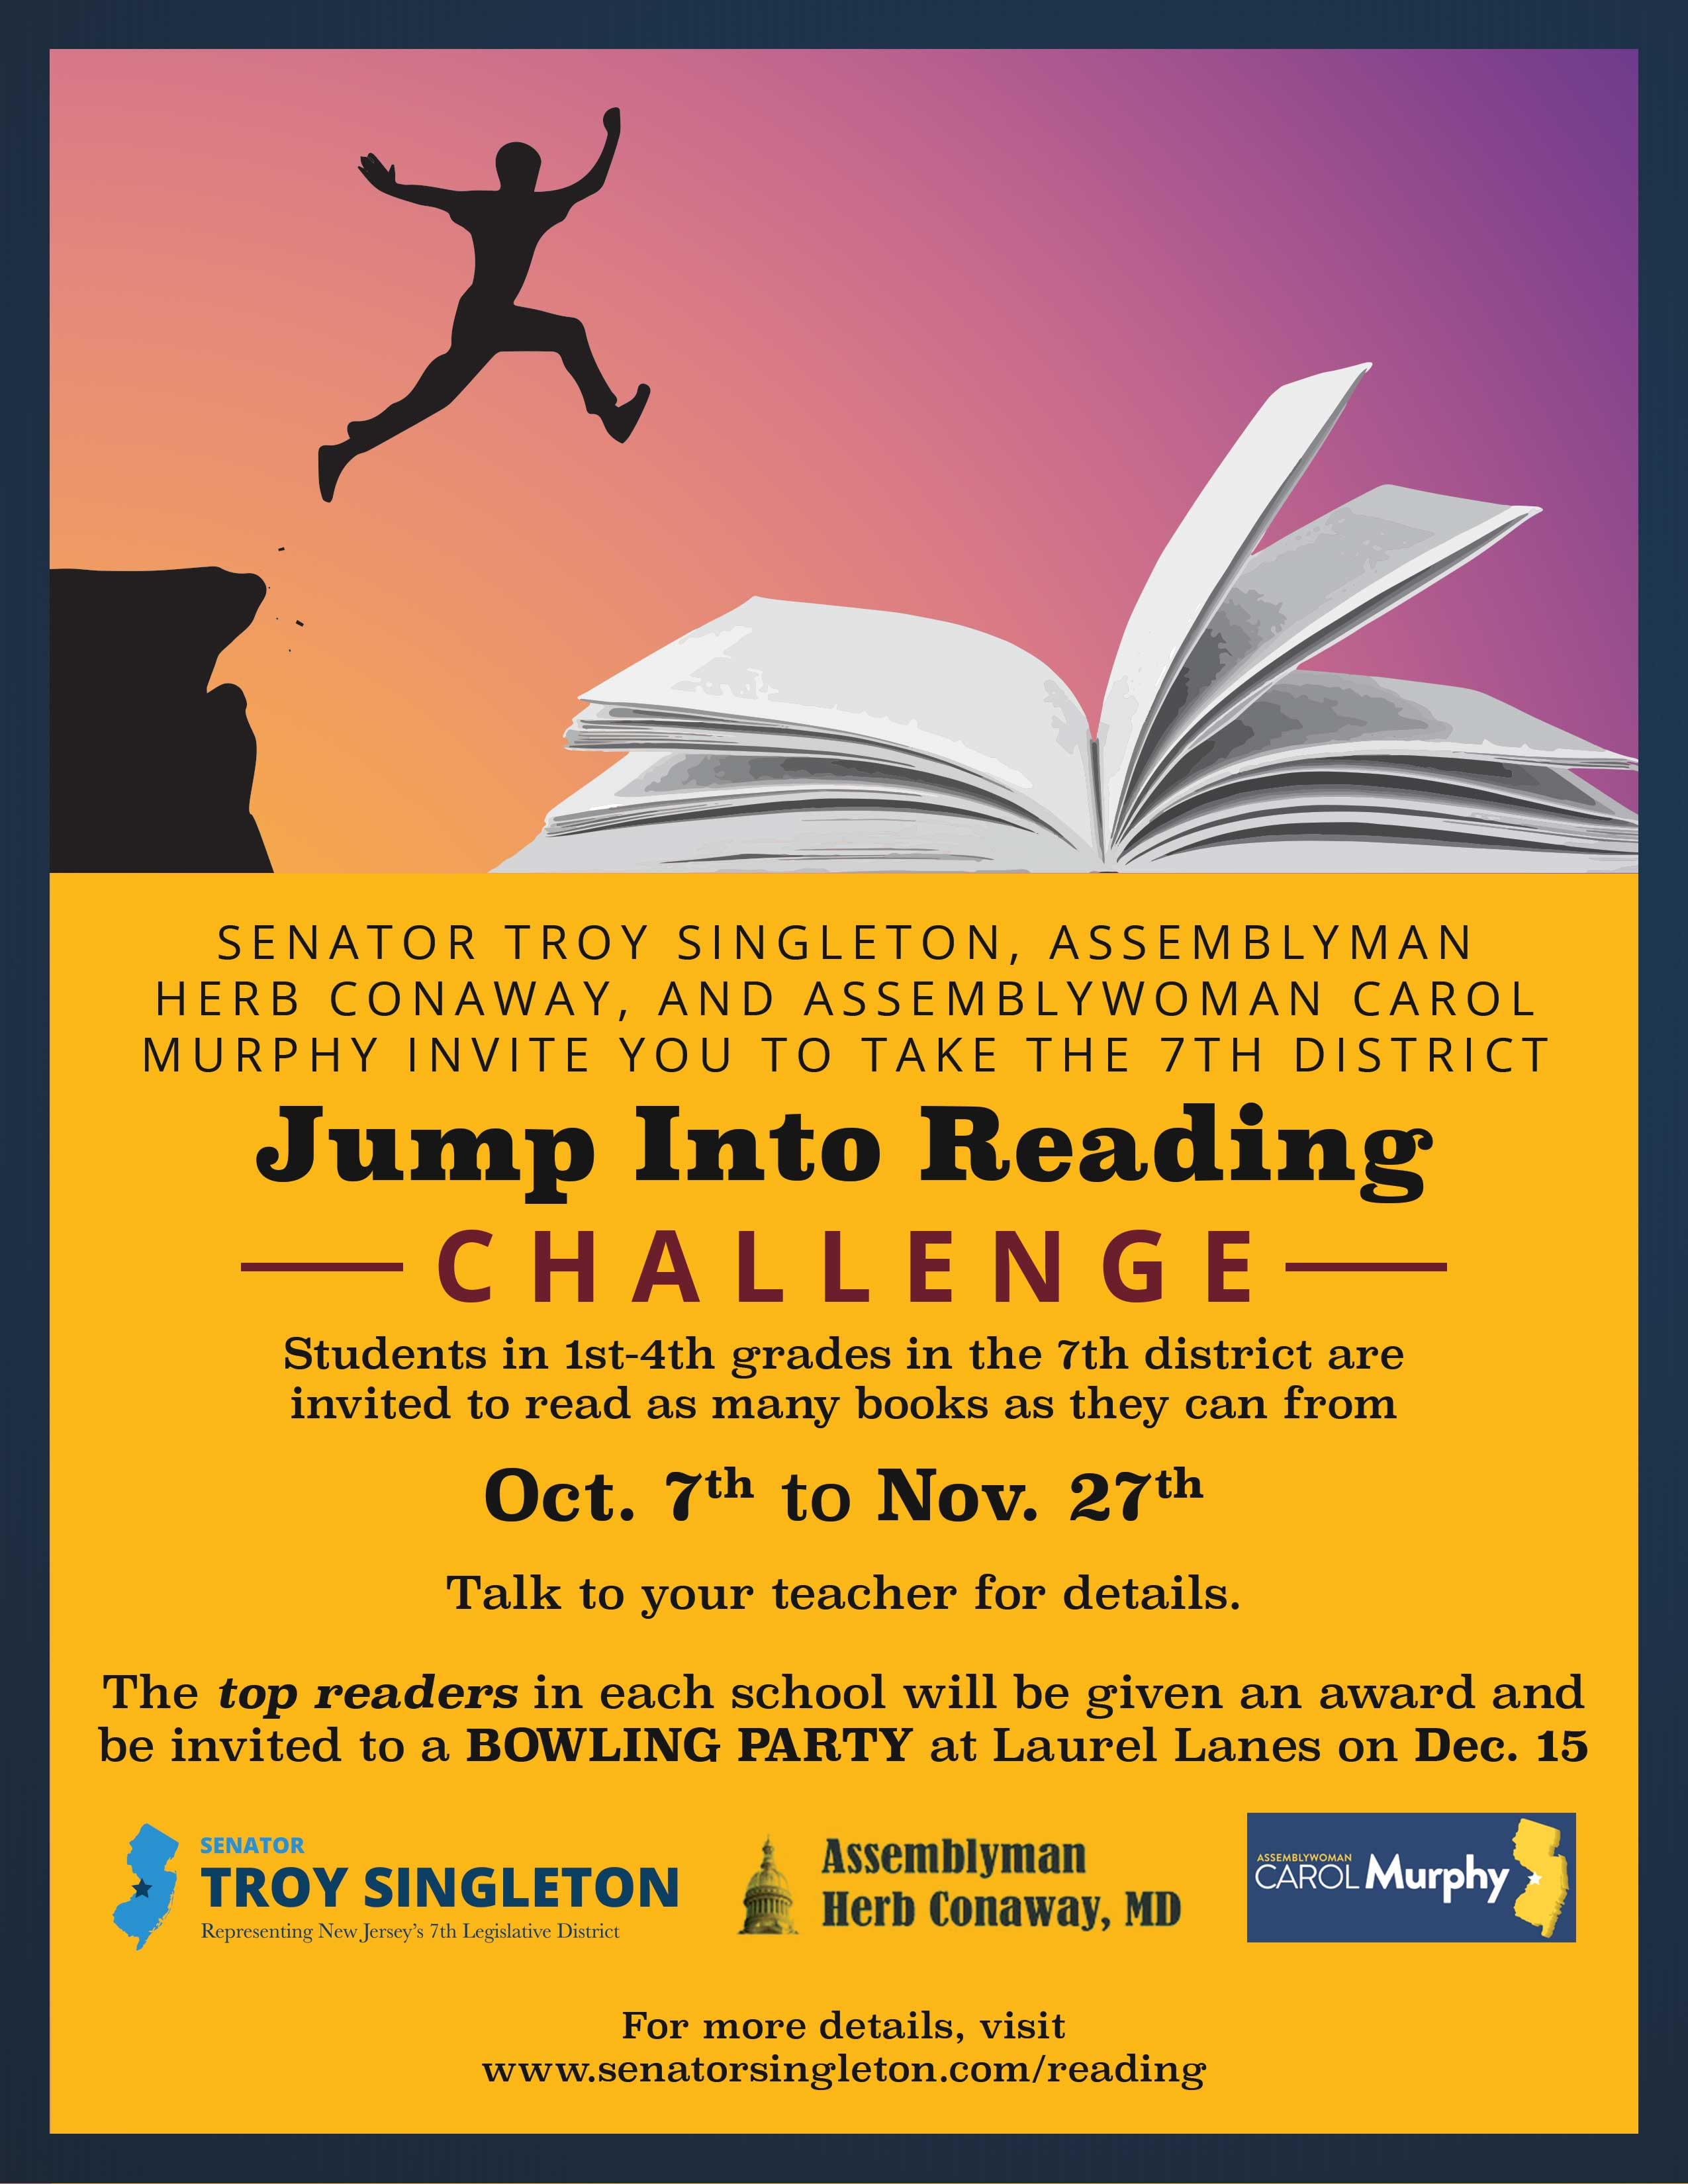 reading-challenge-2019-singleton_conaway_murphy.jpg